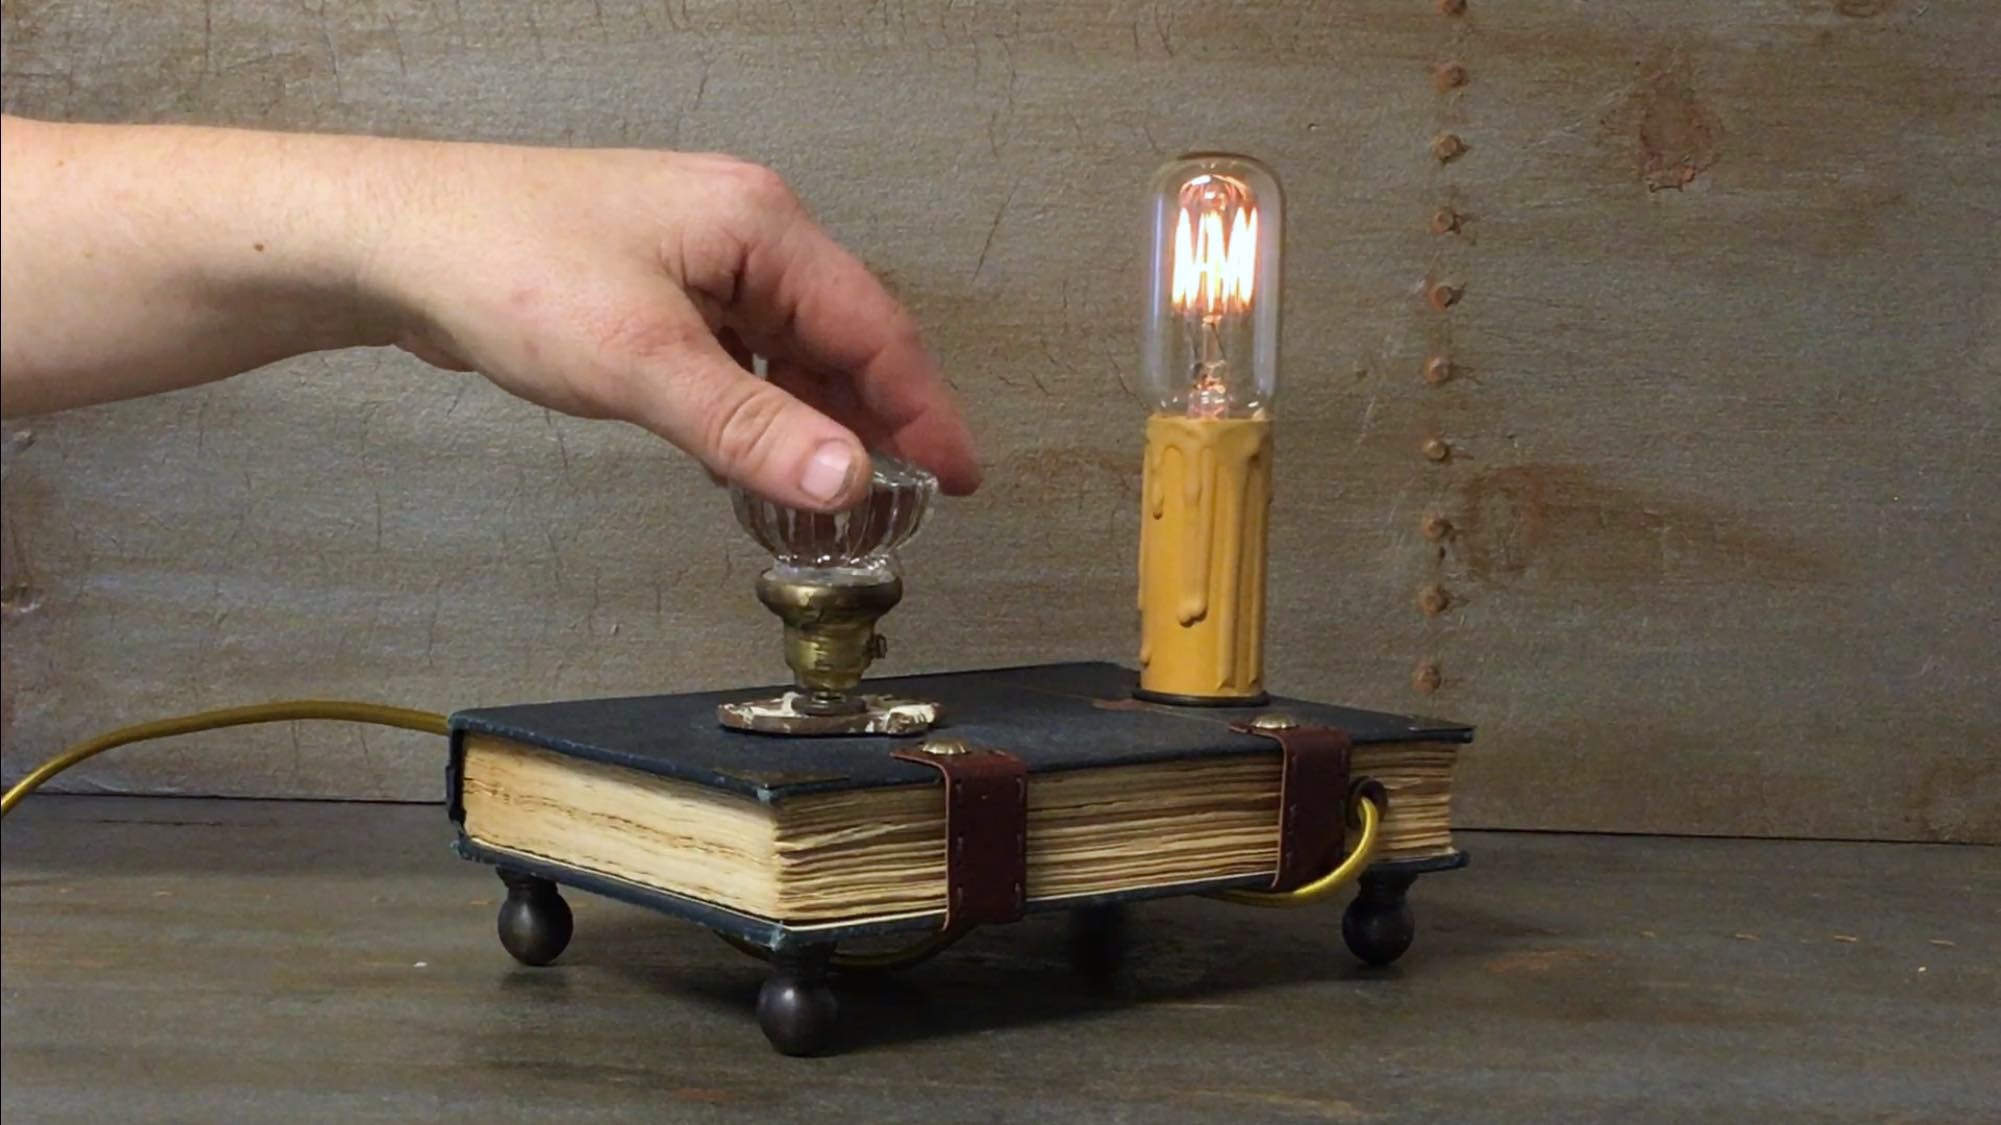 Book lamp knob demo.jpg